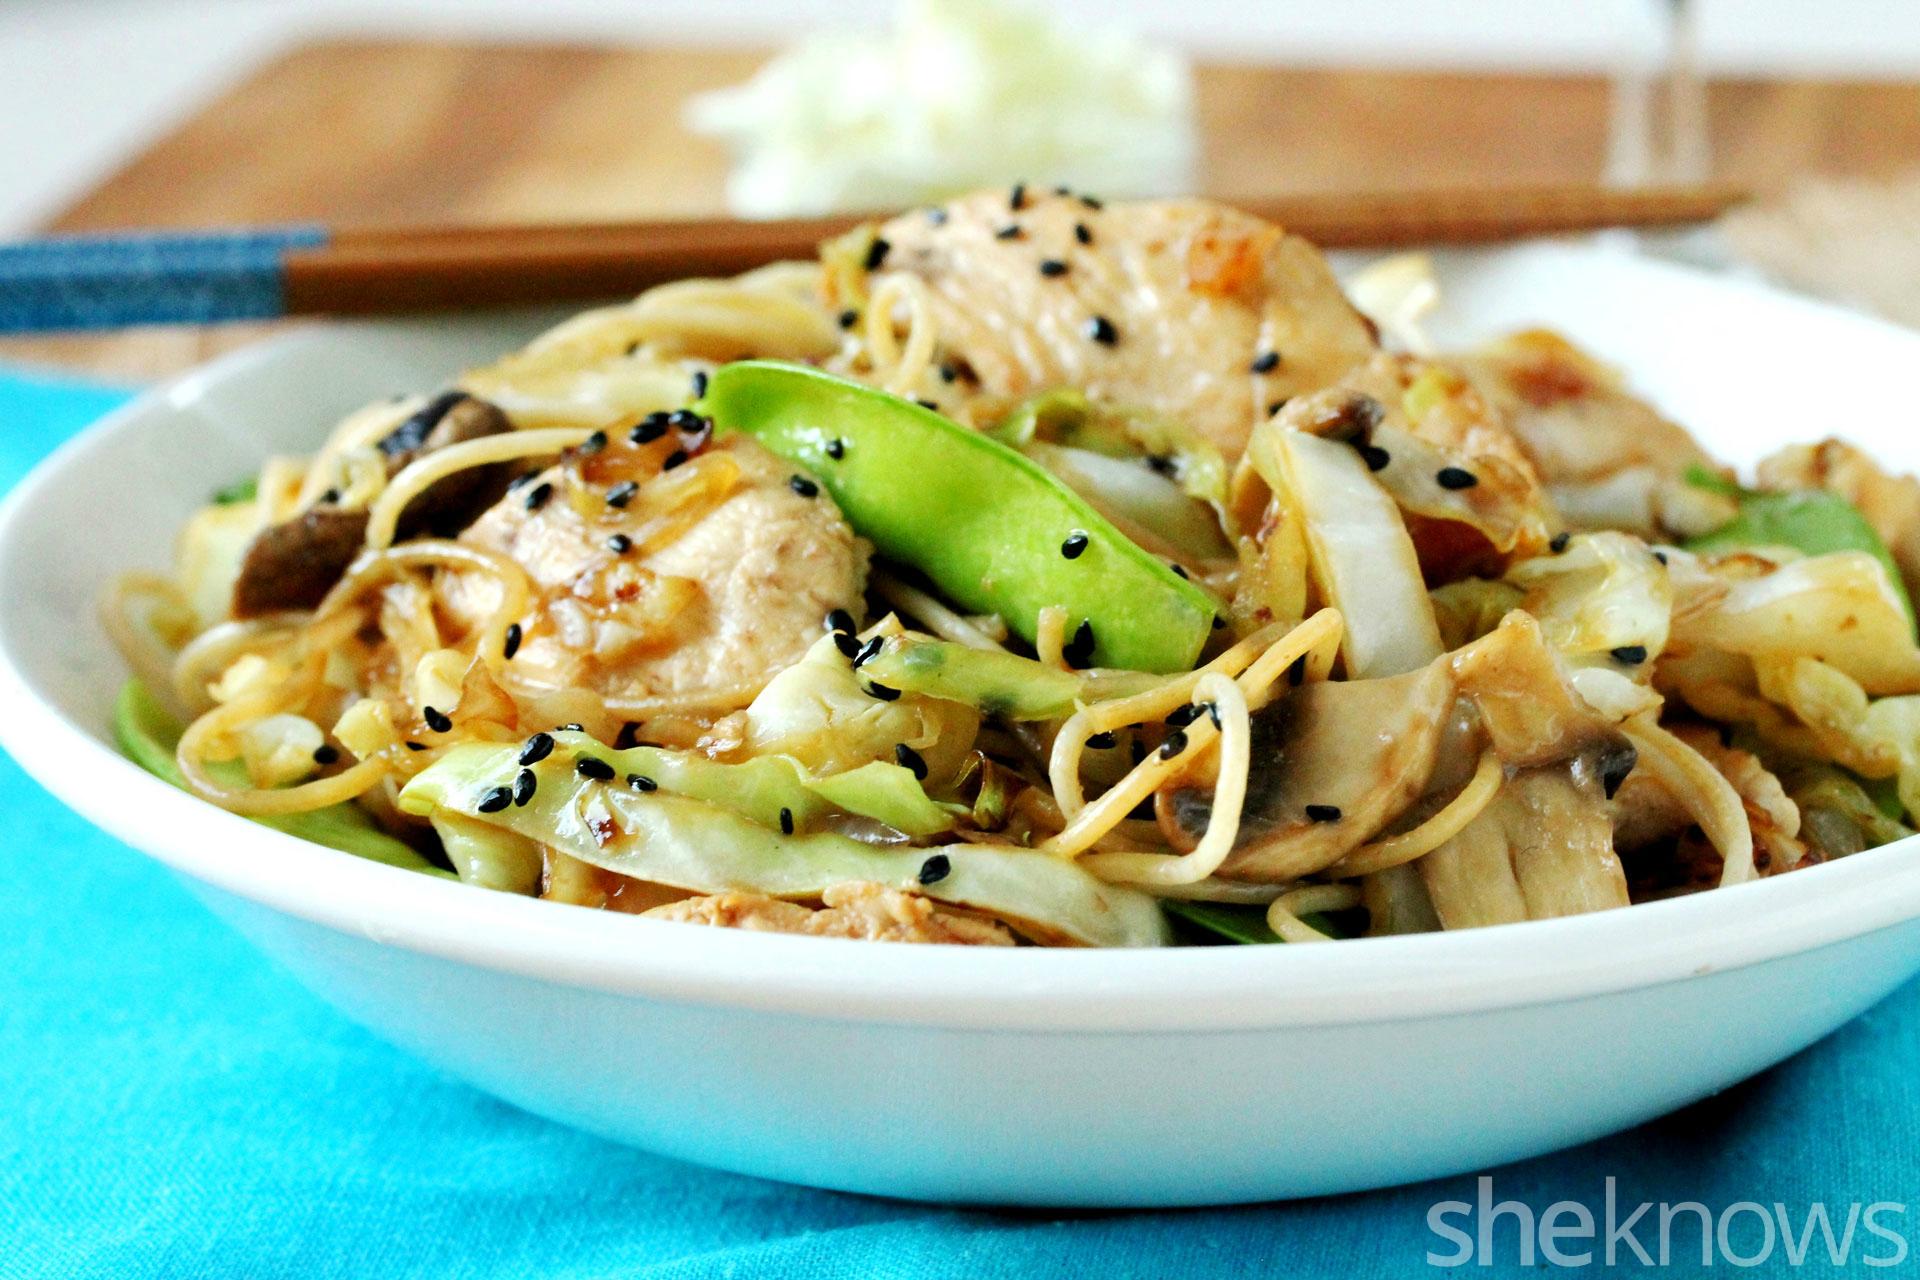 Cabbage and wheat pasta veggie stir-fry